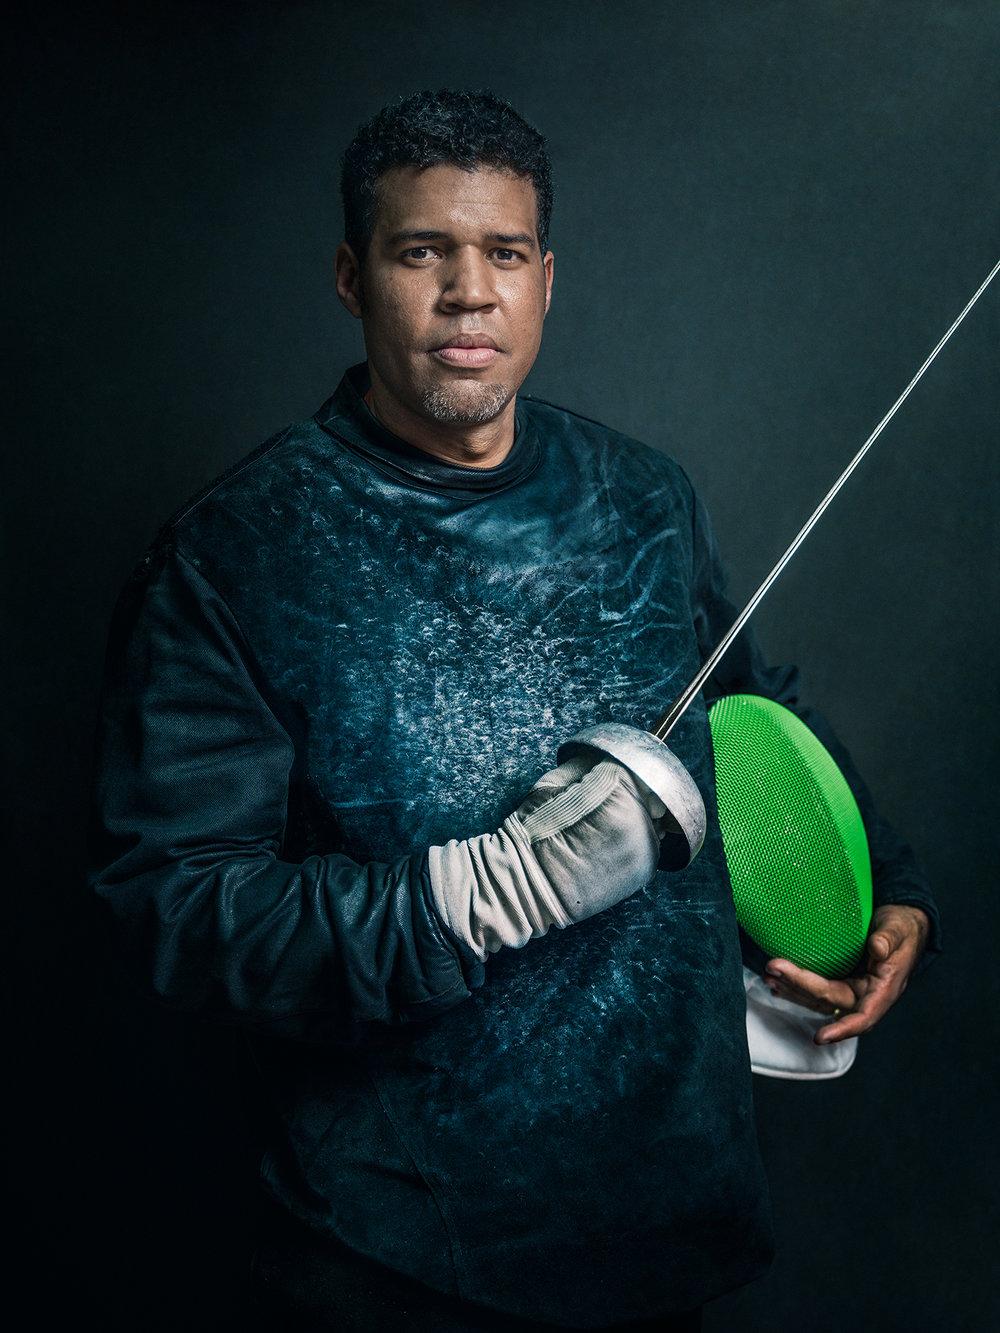 Oscar-arribas-esgrima-maestro-fencing-master-fencer-fechten-scherma-escrime-portrait-fotografo-retrato-photographer027.jpg